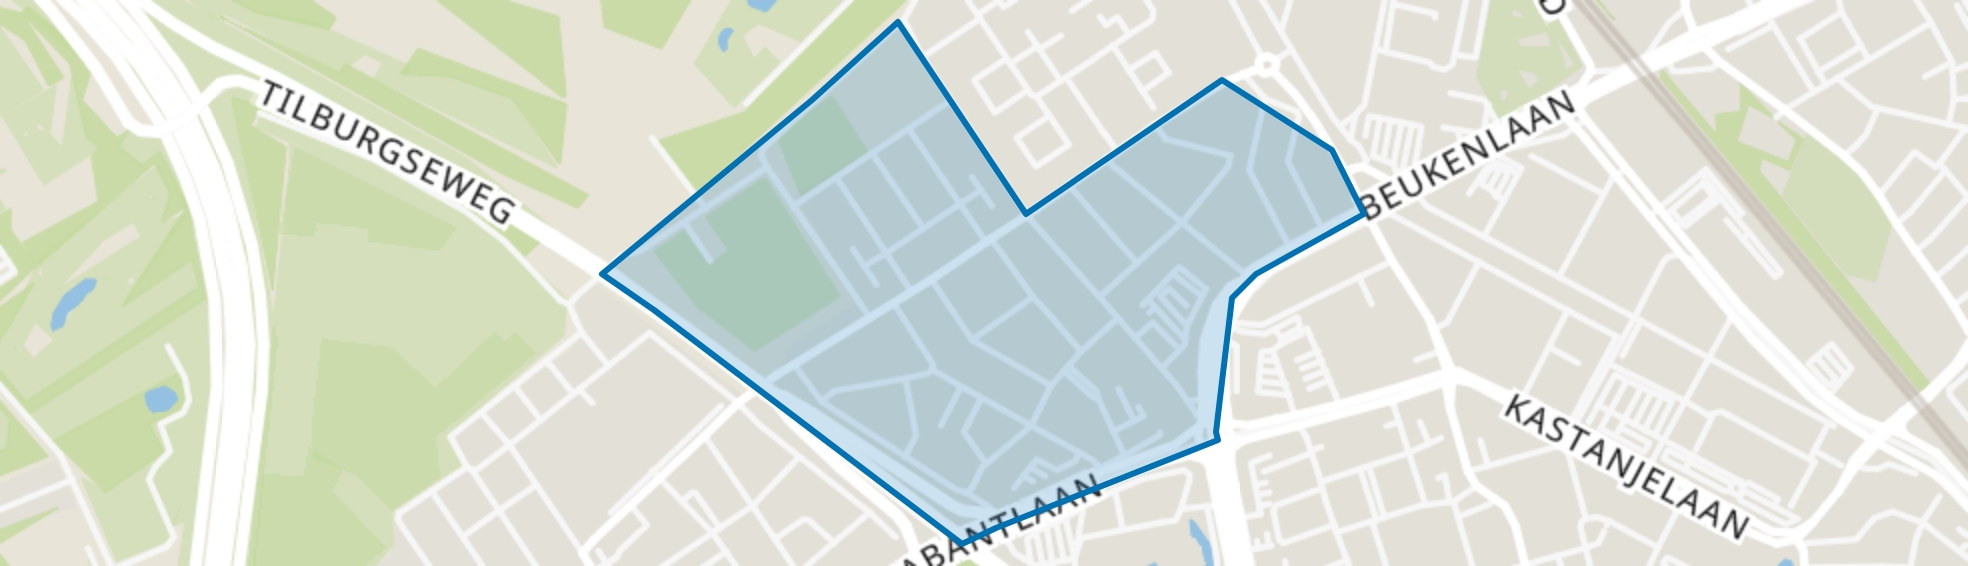 Drents Dorp, Eindhoven map